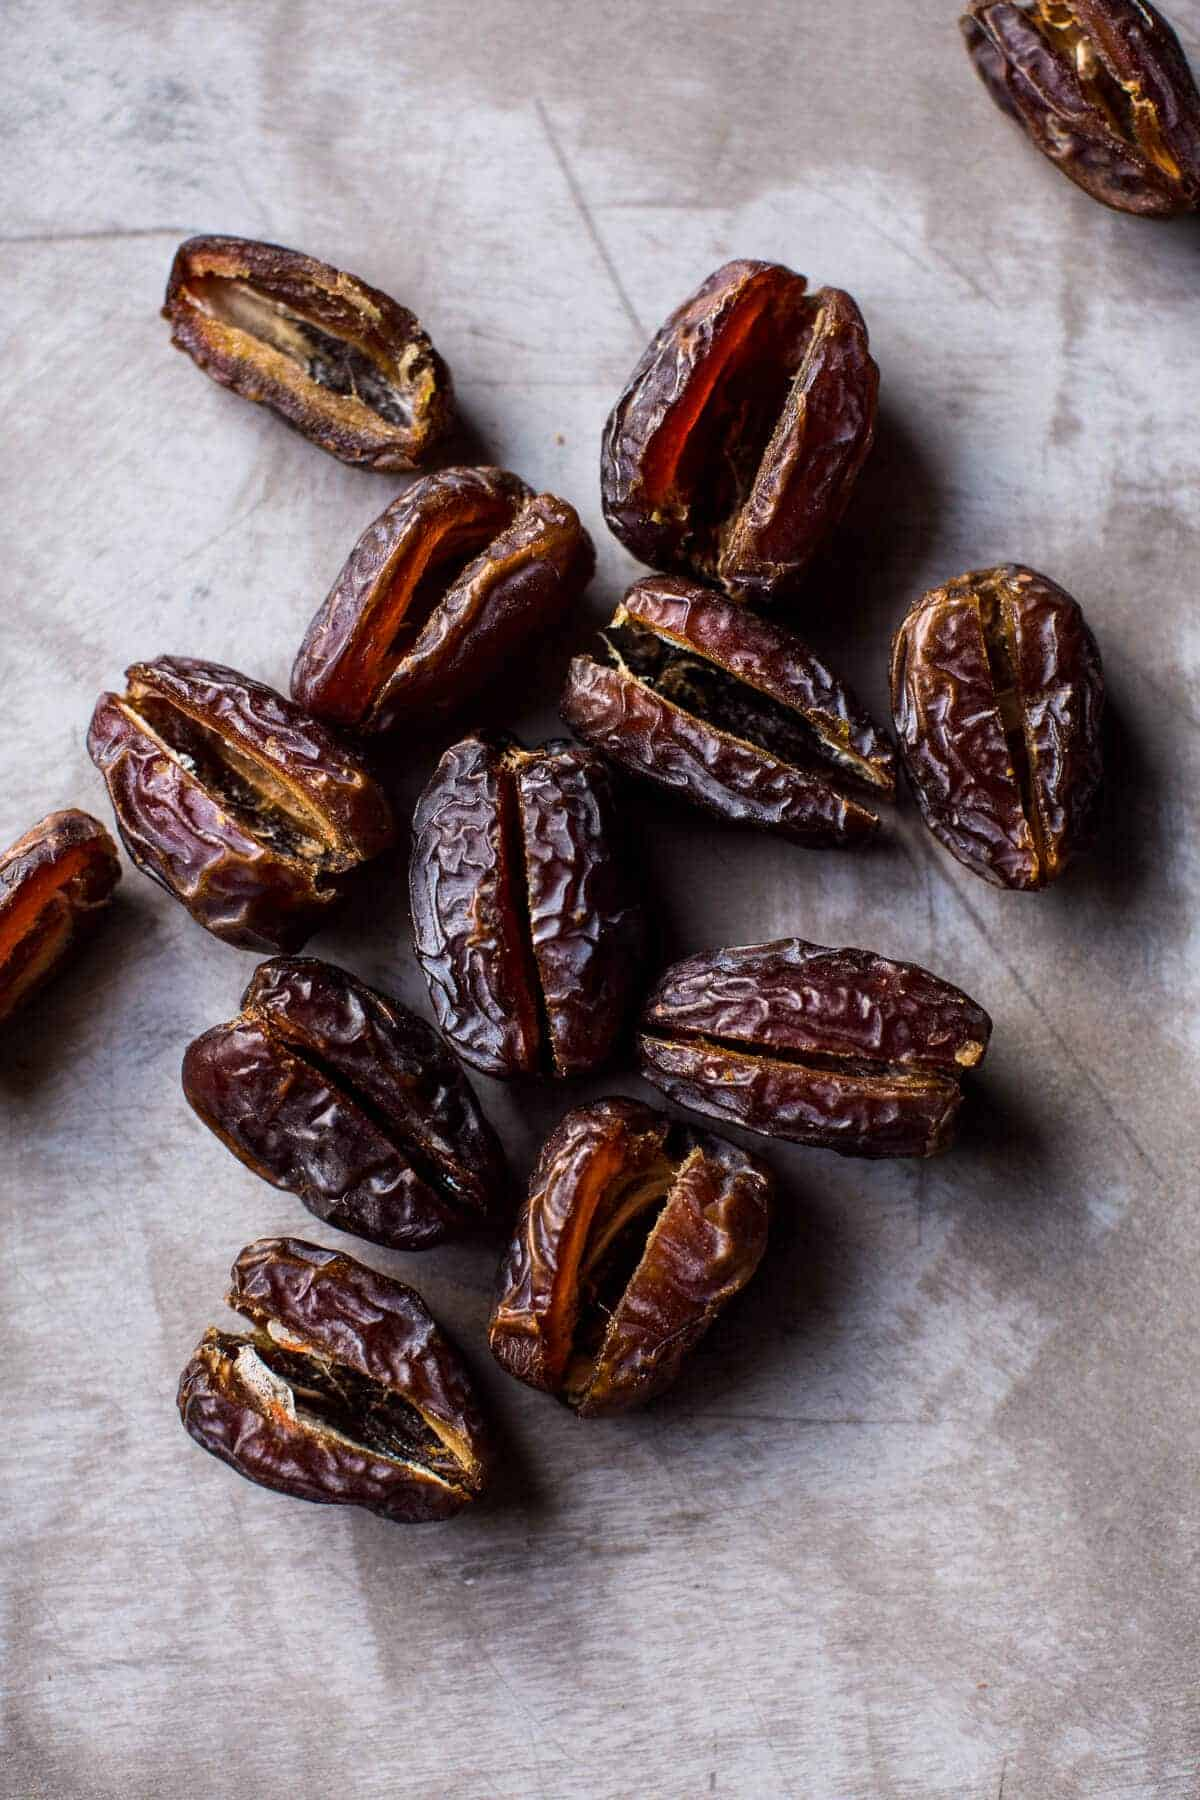 Chocolate Coconut Almond Bars | halfbakedharvest.com @hbharvest